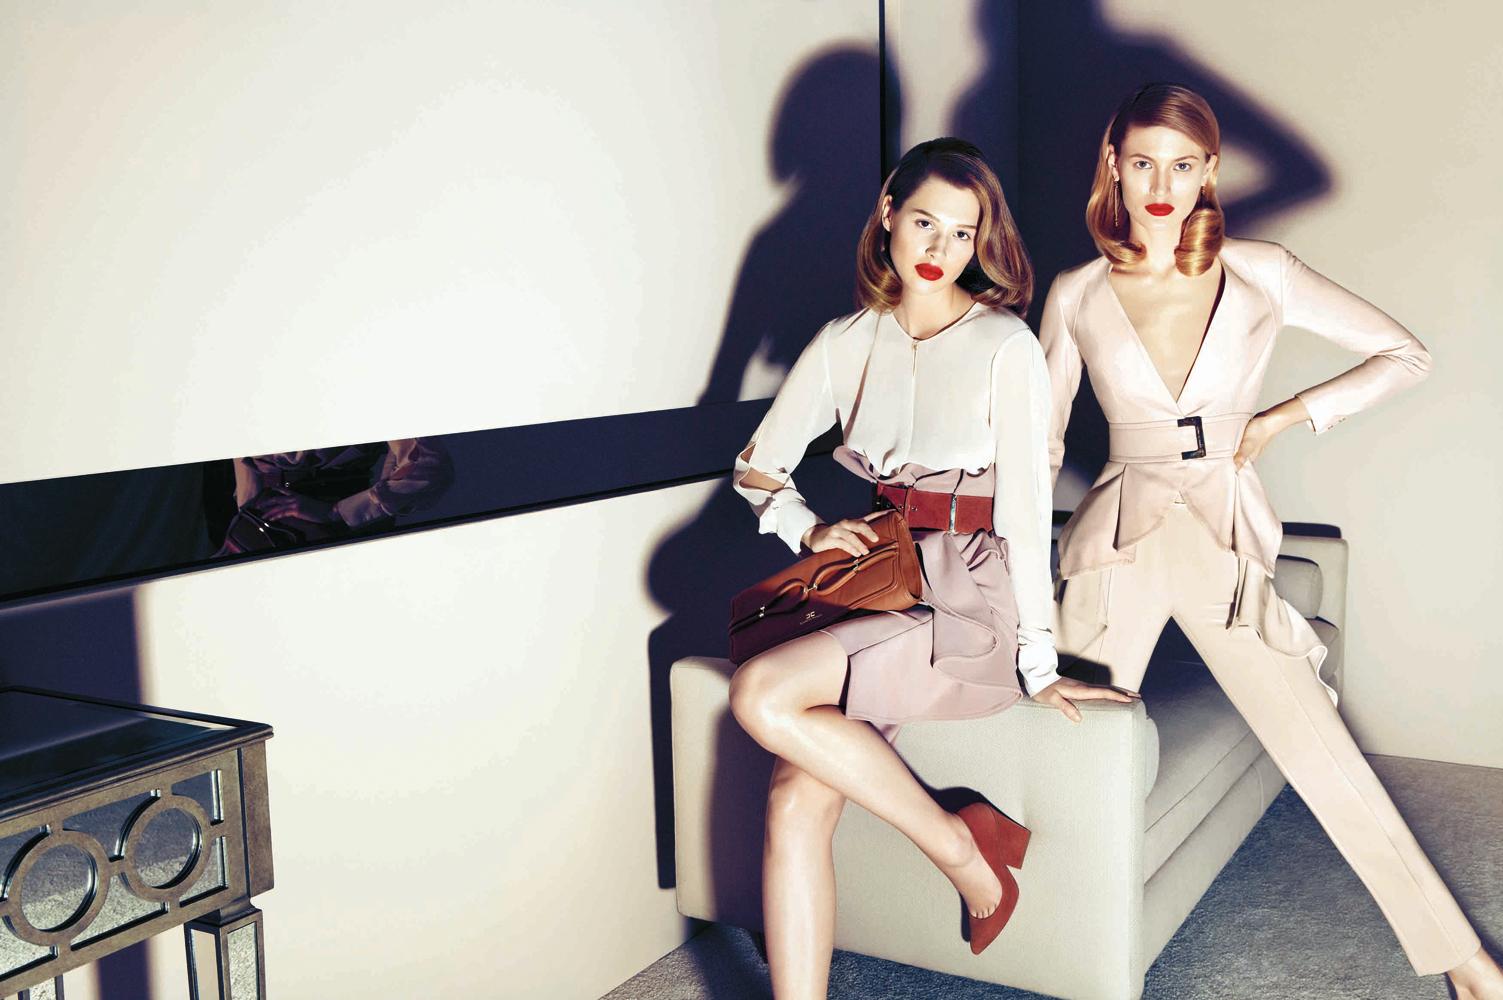 Elisabetta Franchi Fall 2013 | Andoni & Arantxa | Elisabetta Franchi | Numerique Retouch Photo Retouching Studio